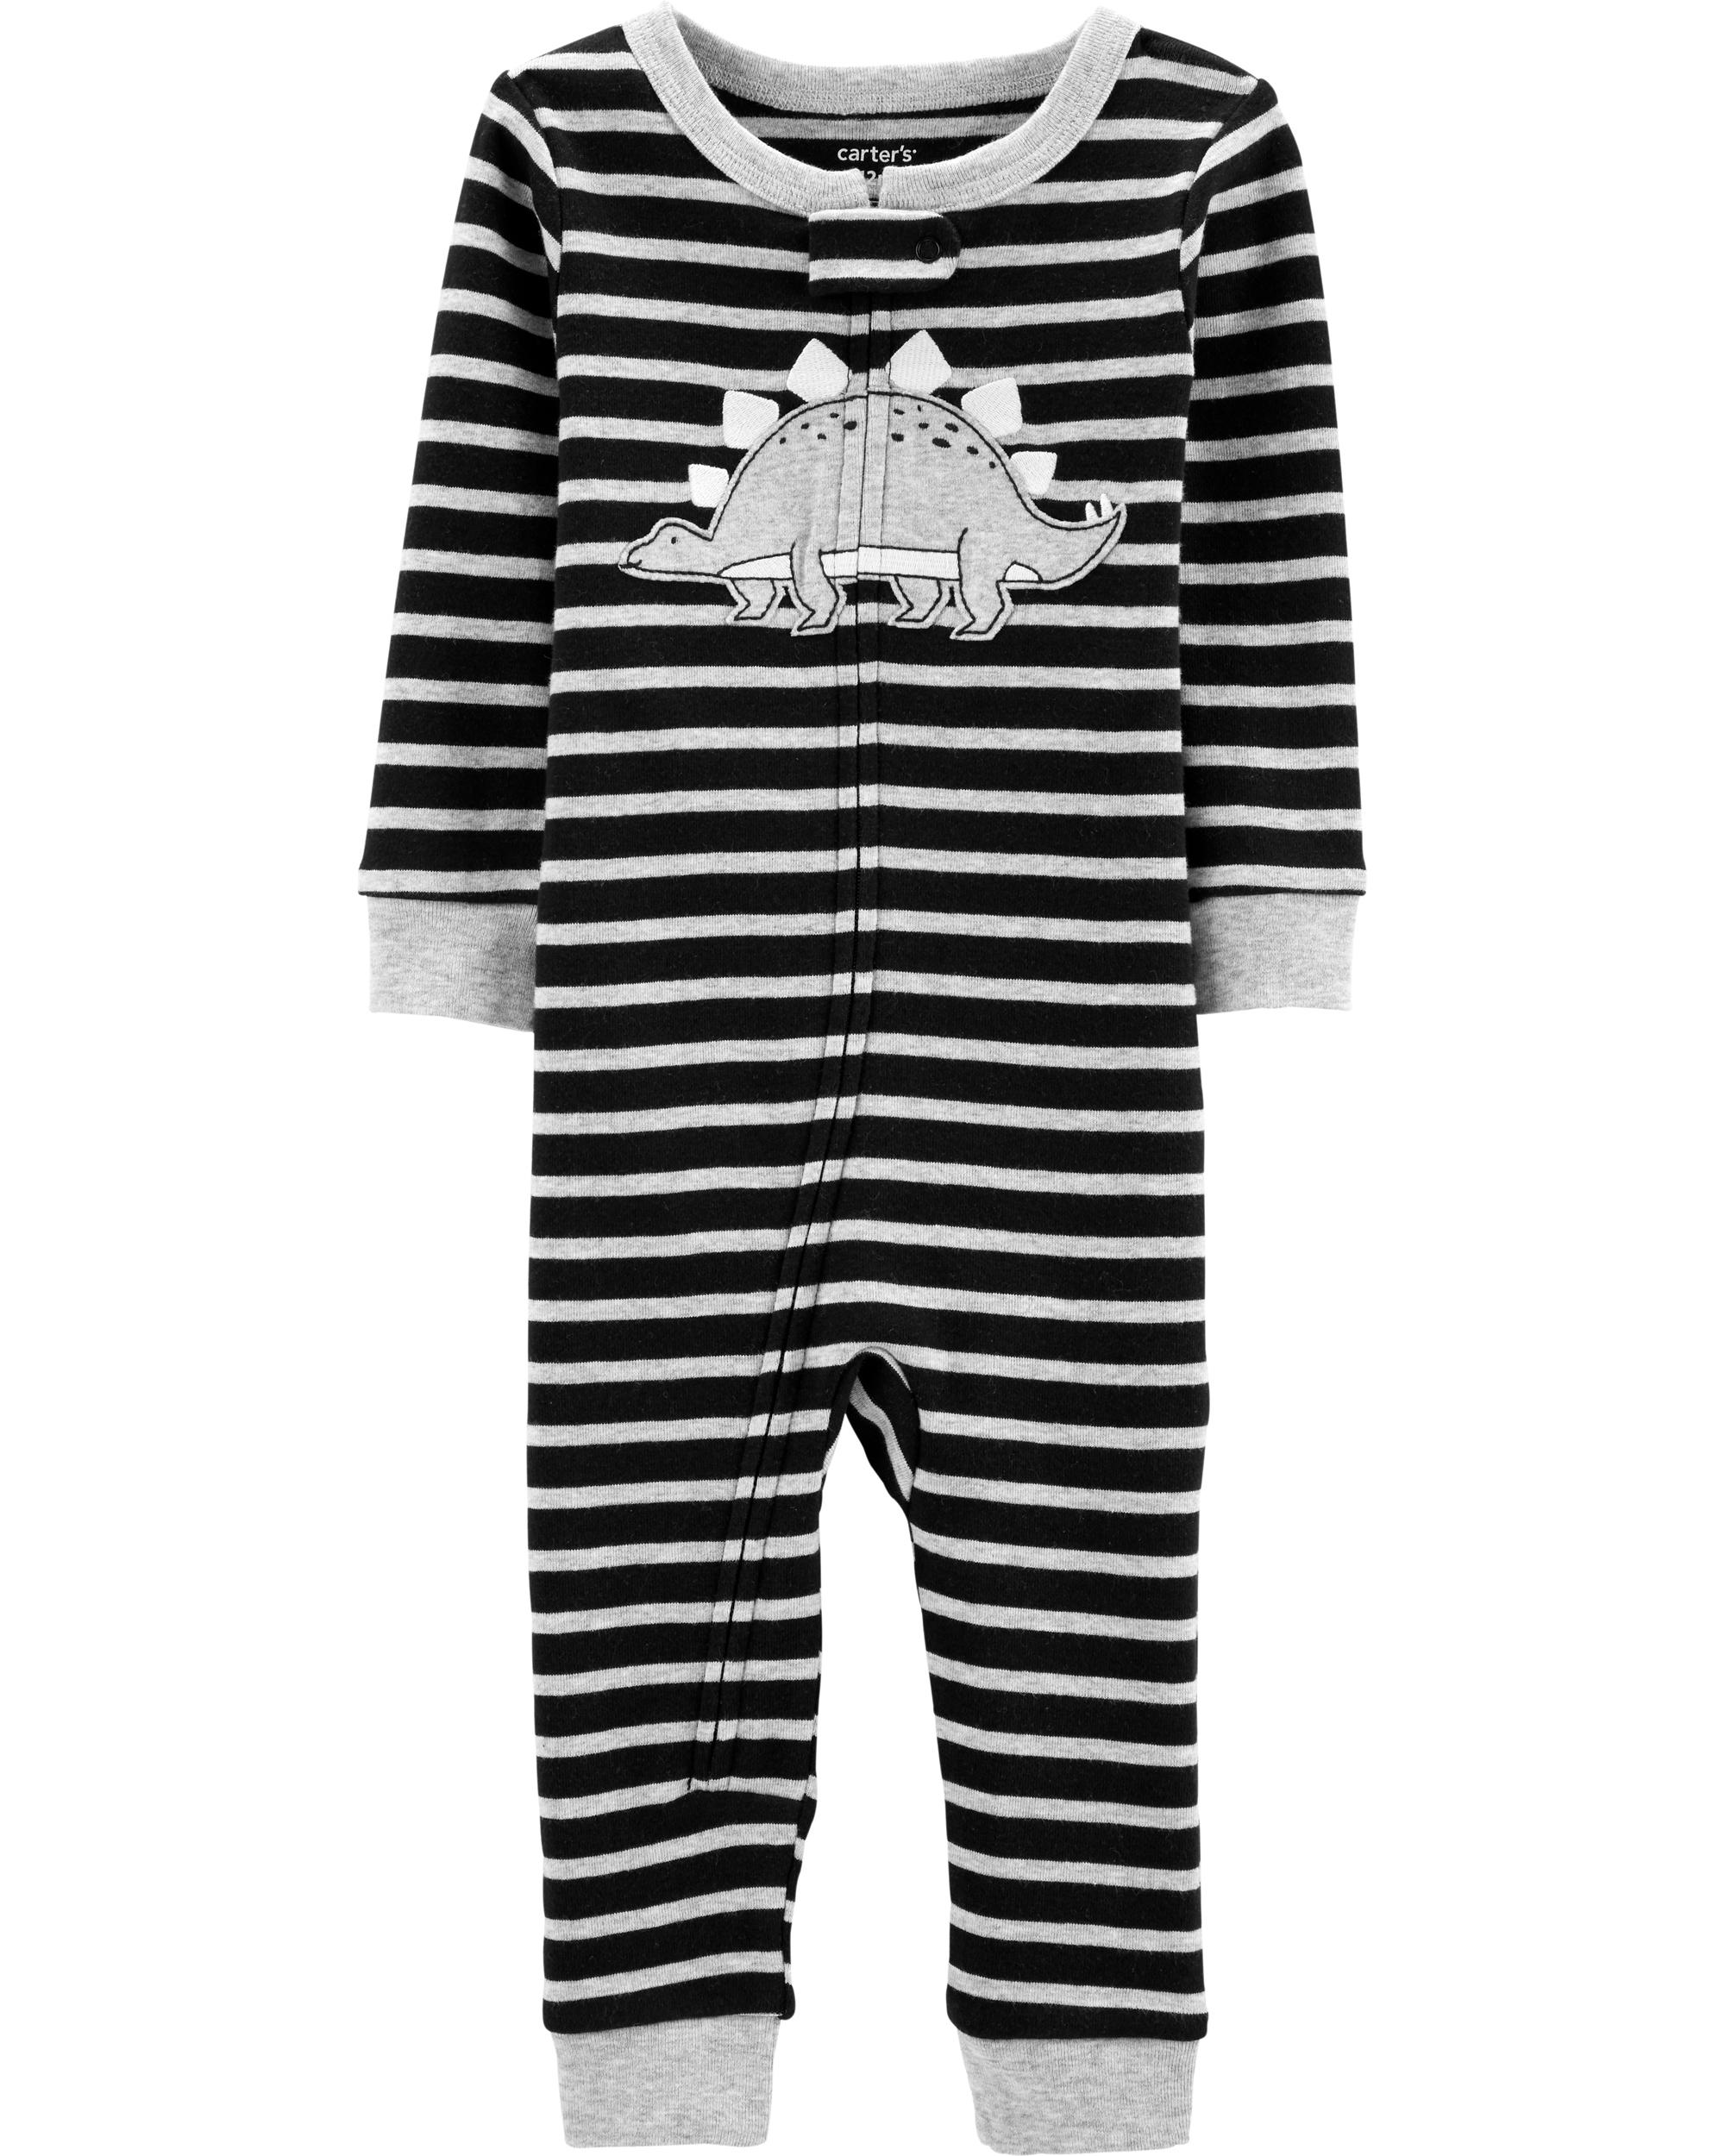 New Carter/'s 1-Piece Dinosaur Snug Fit Cotton Footless Pajama PJs Boy Sleeper